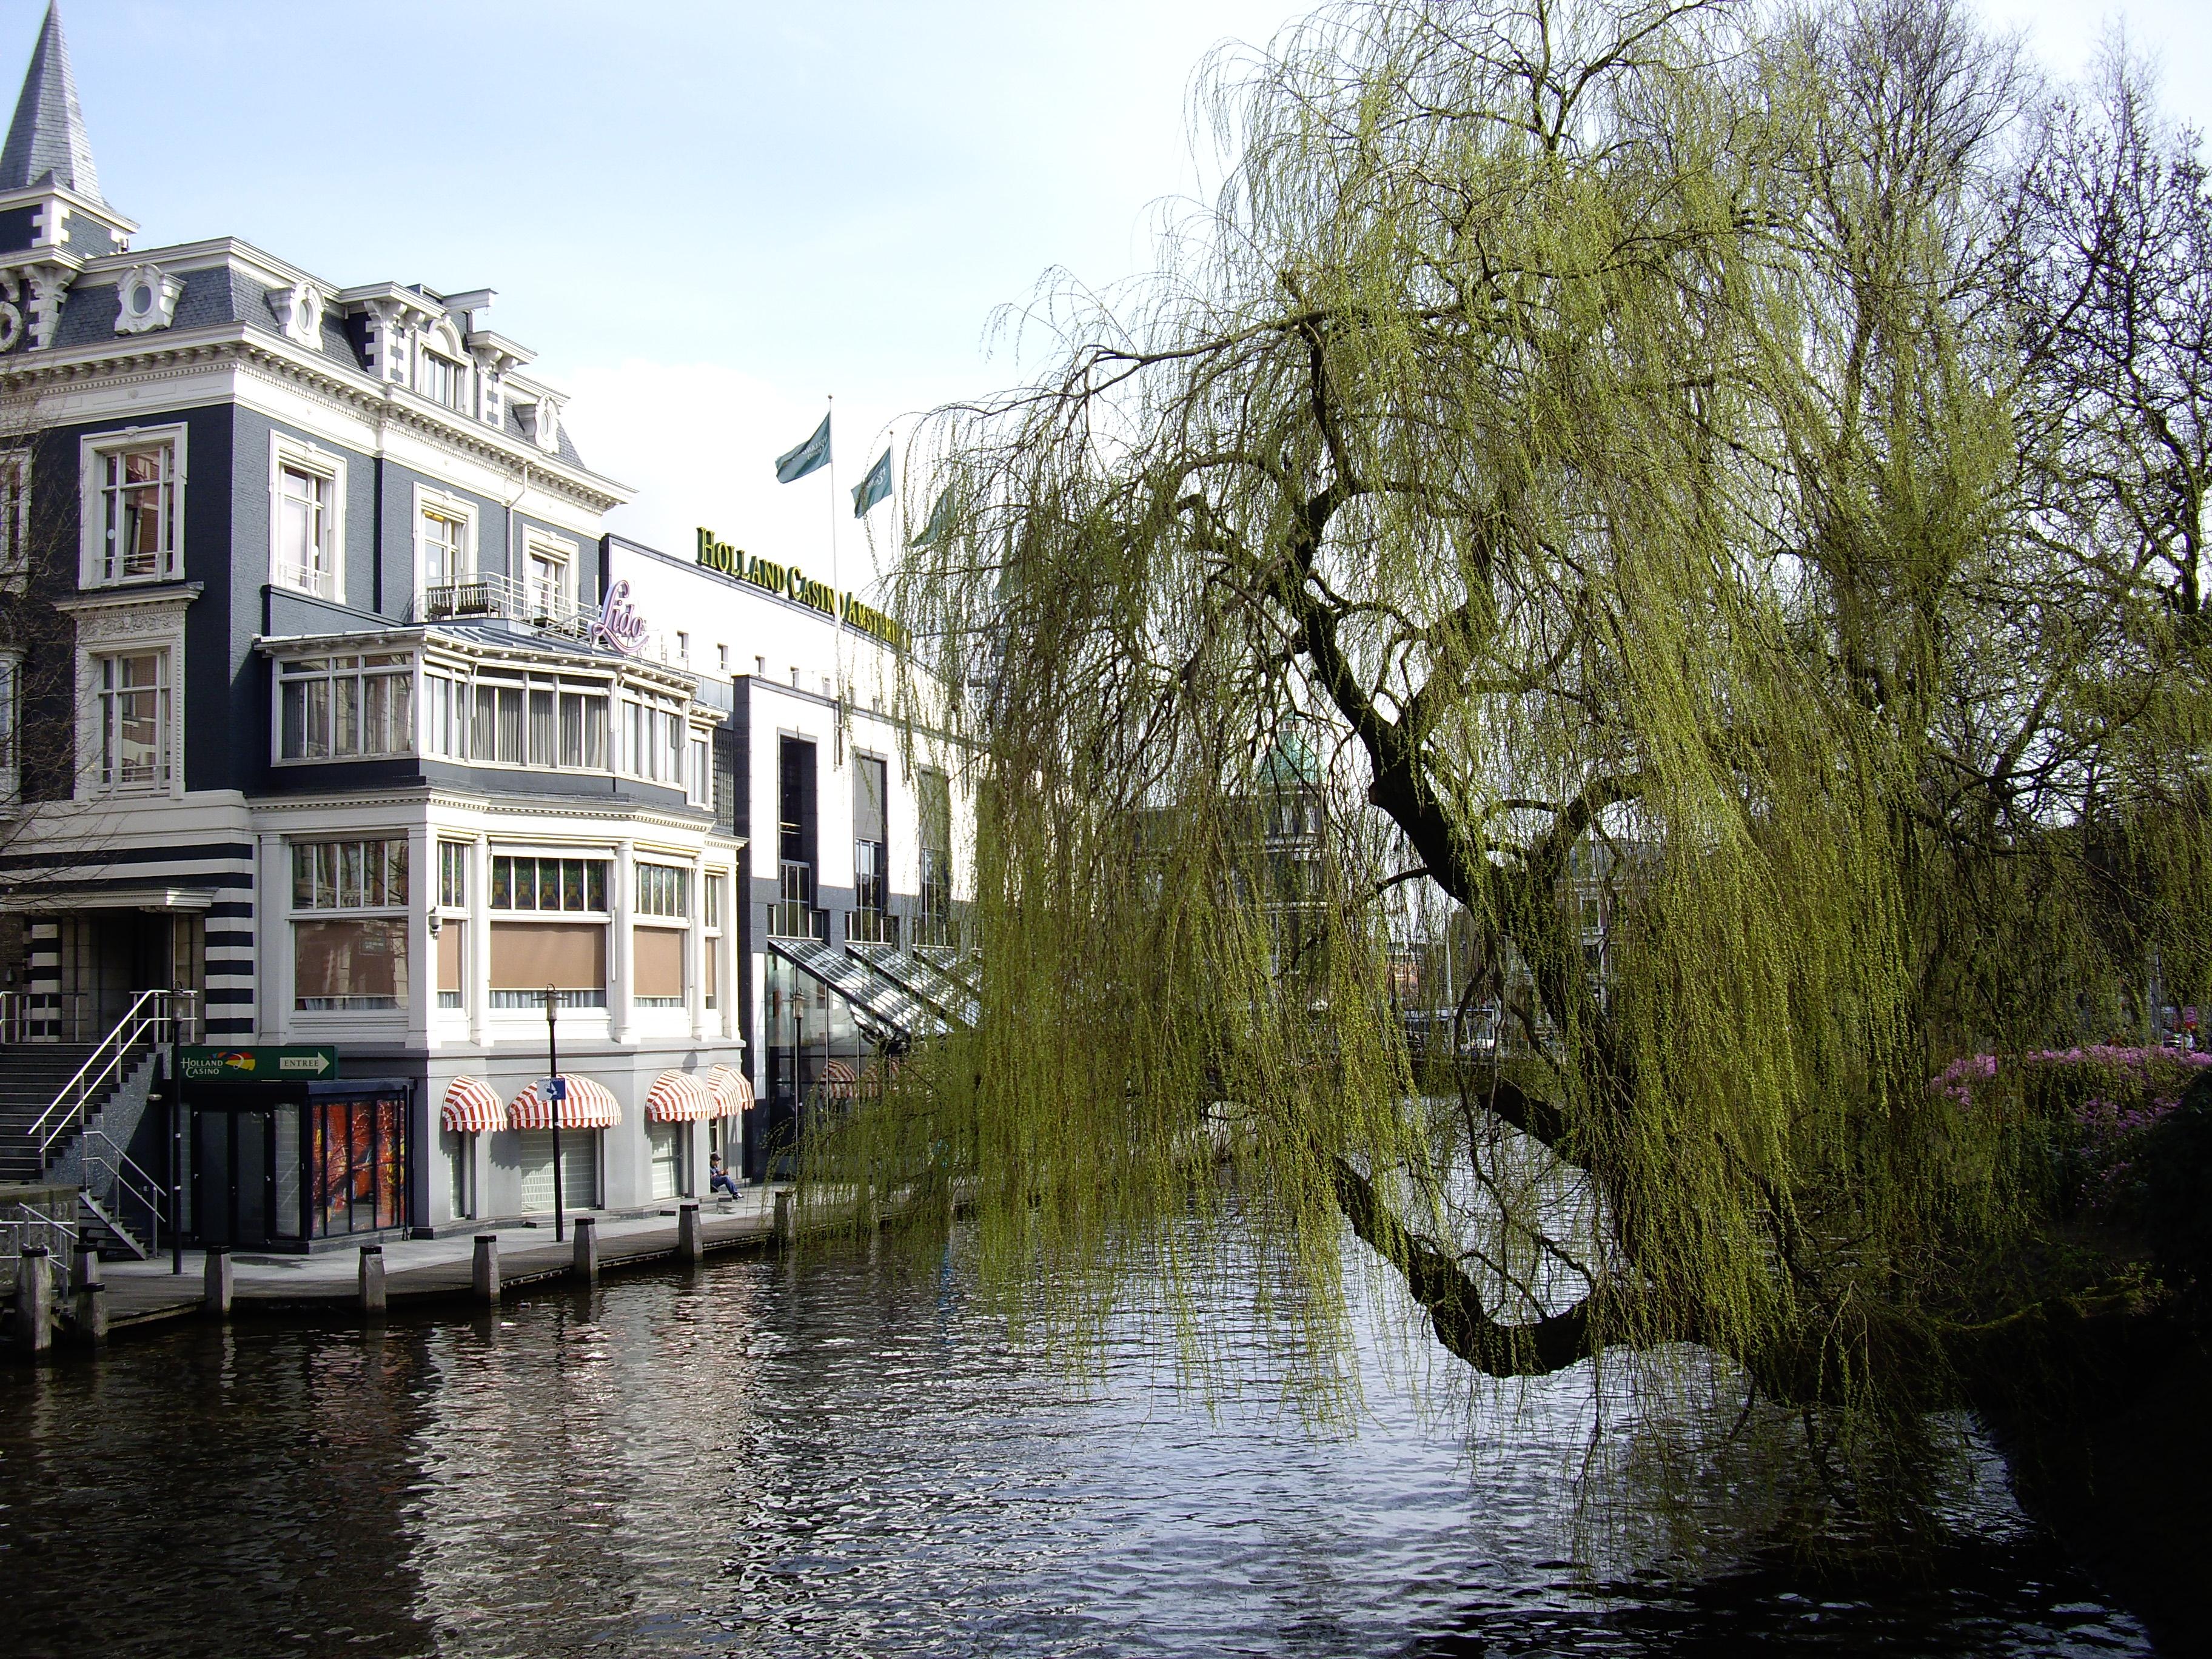 AMSTERDAM - Voyage Week End Escapage Visiter Amsterdam - 4519810035_e07b949d01_o